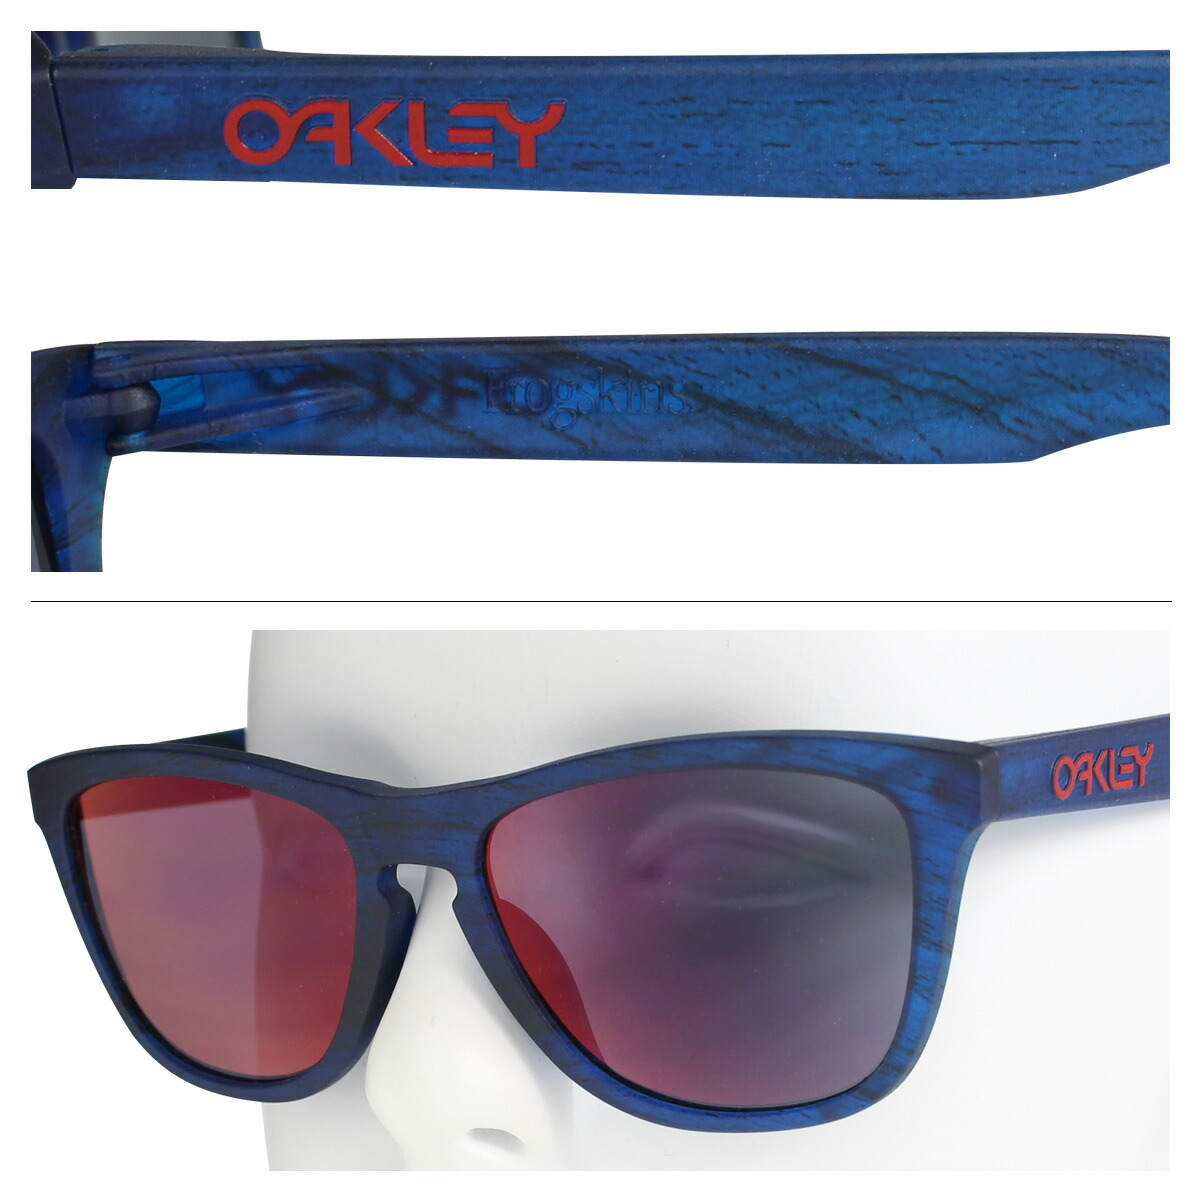 3d3e93810d  楽天市場  SOLD OUT  オークリー サングラス アジアンフィット Oakley Frogskins フロッグスキン